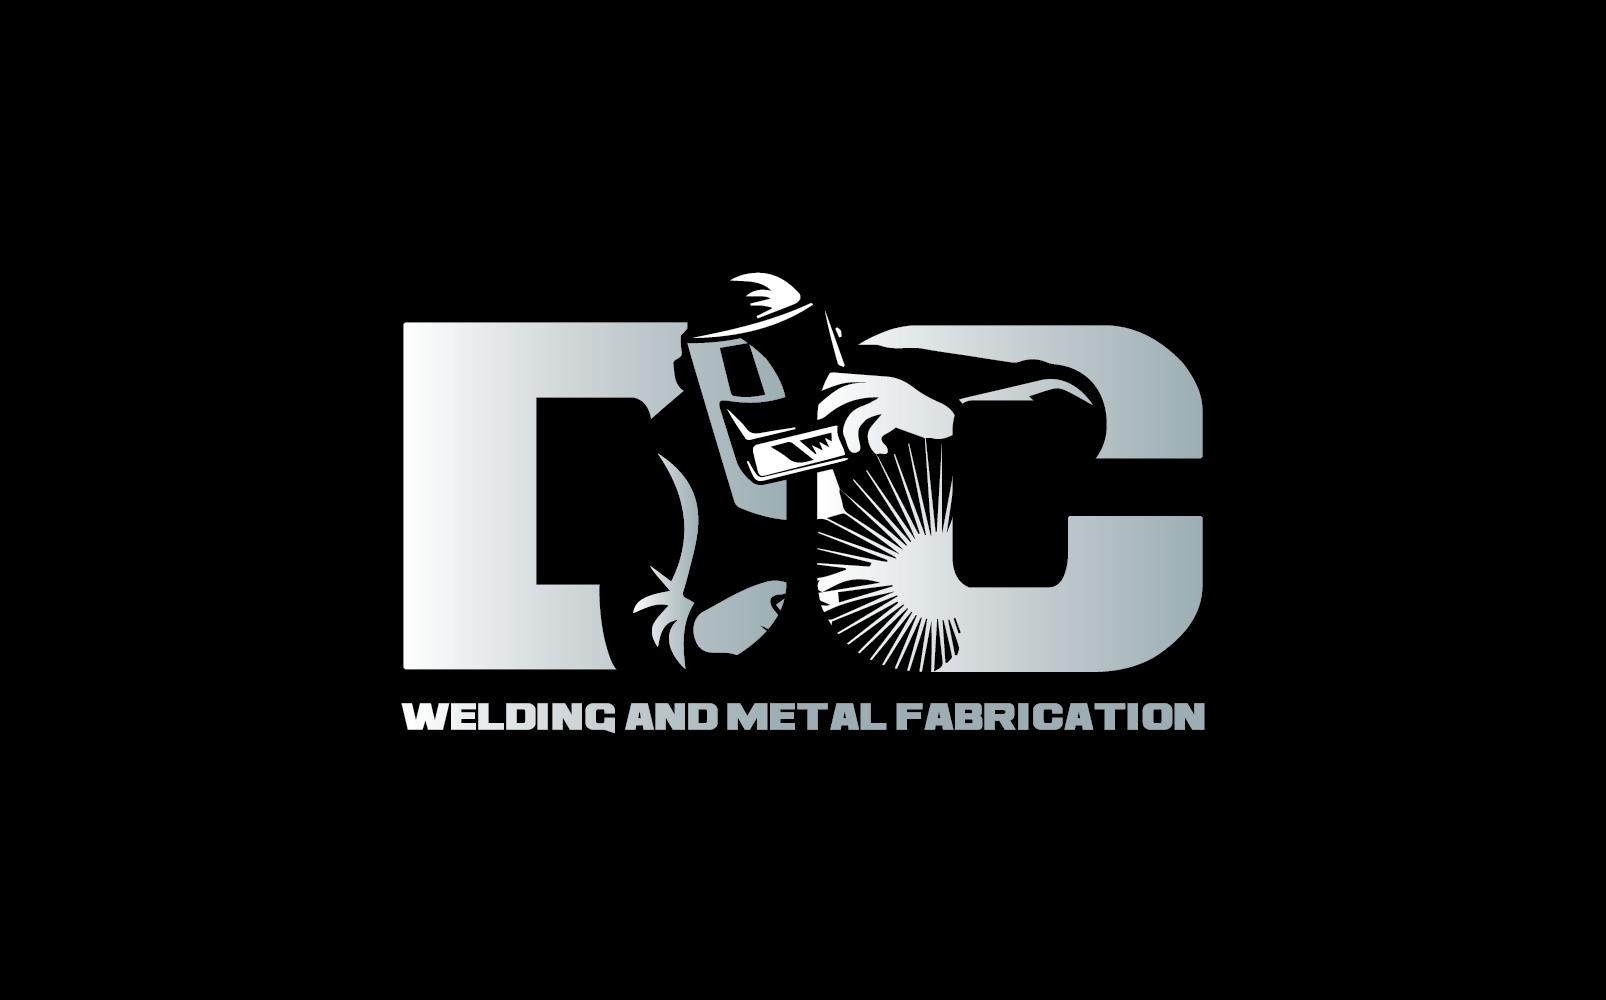 Logo Design by pojas12 - Entry No. 3 in the Logo Design Contest Imaginative Logo Design for DC KUSTOM WELDING & METAL FABRICATION.